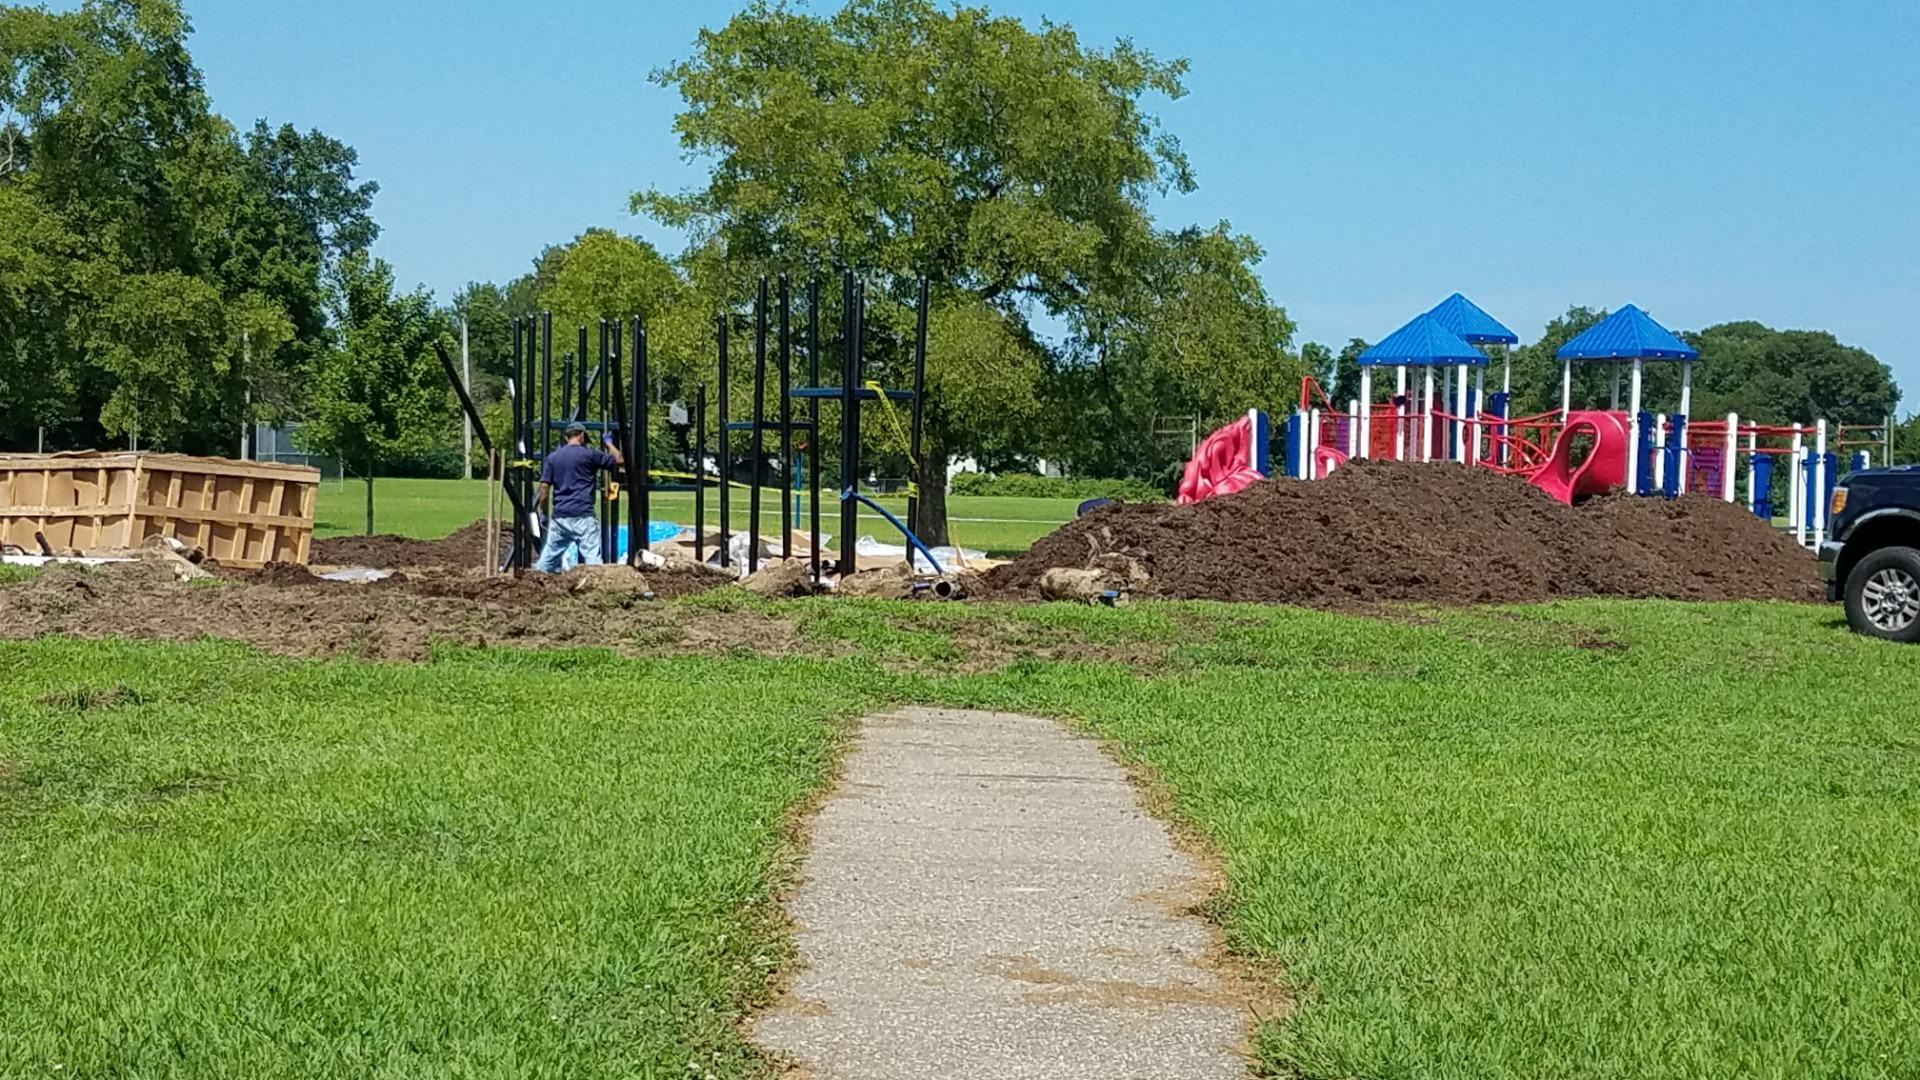 CG playground1